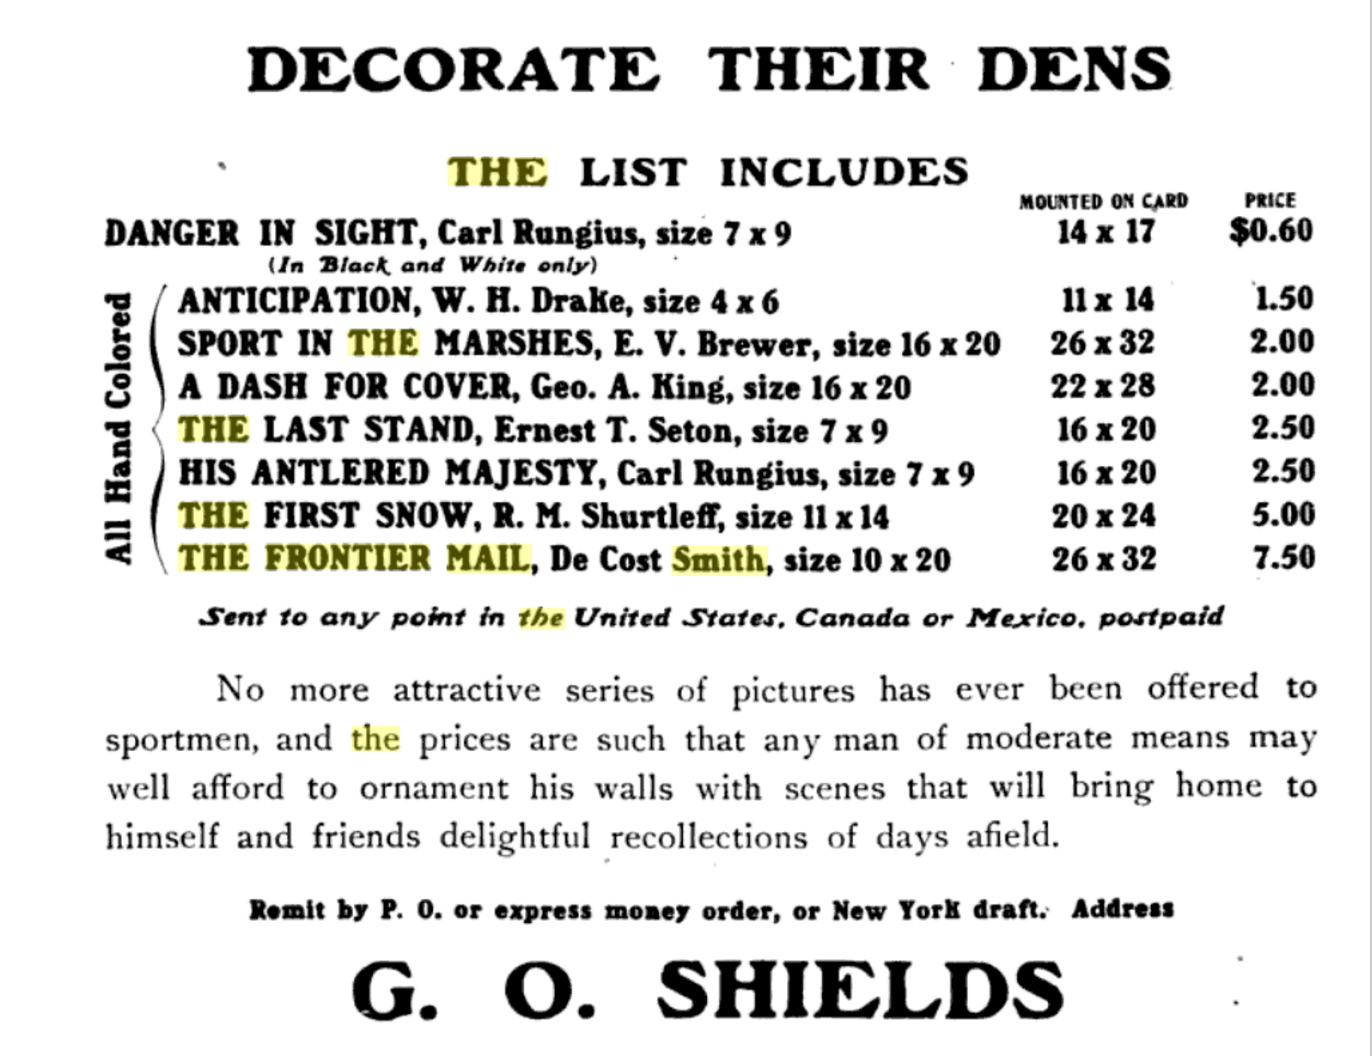 Decorate Their Dens